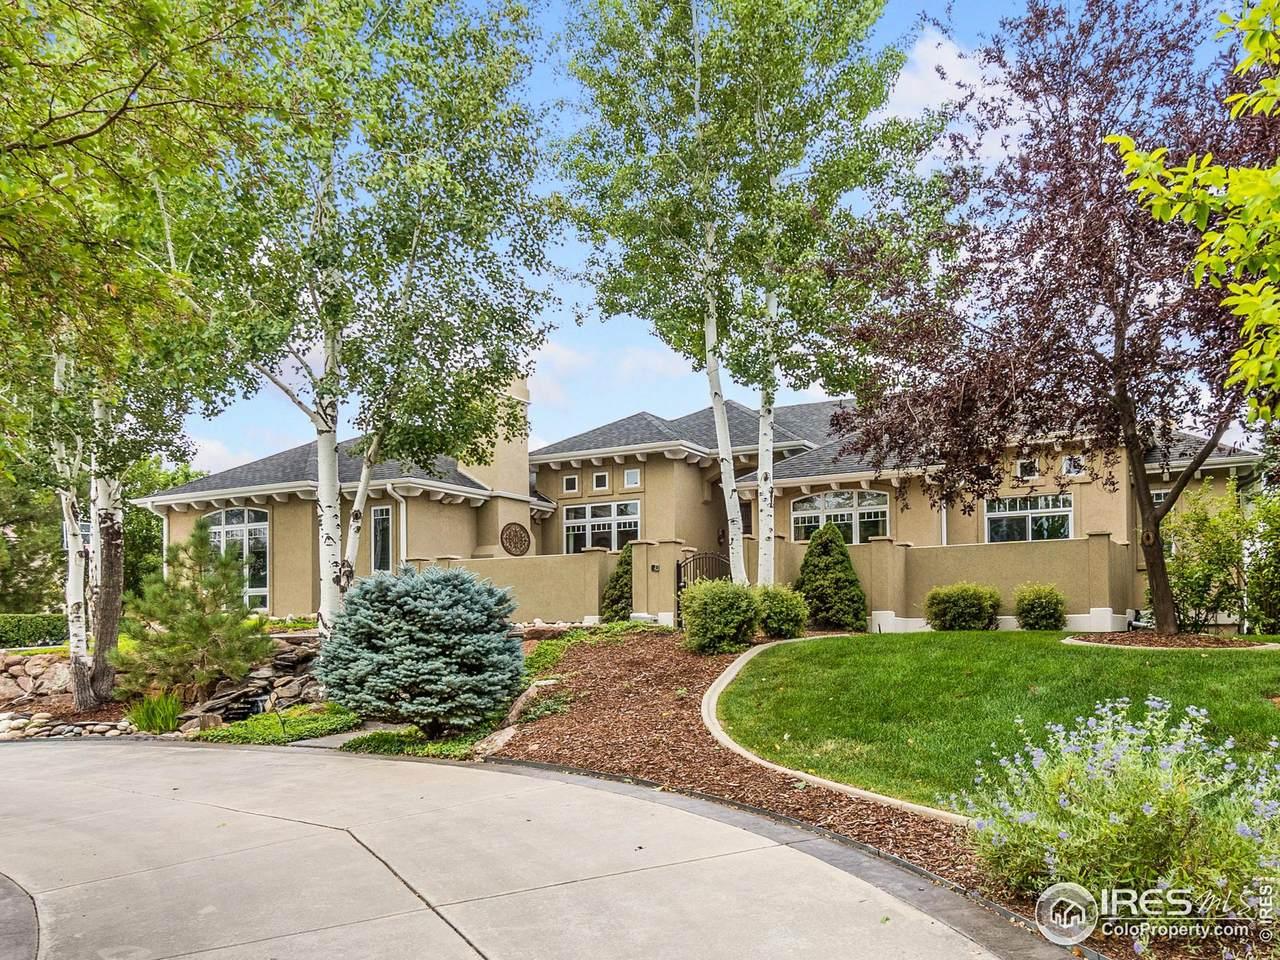 7919 Eagle Ranch Rd - Photo 1